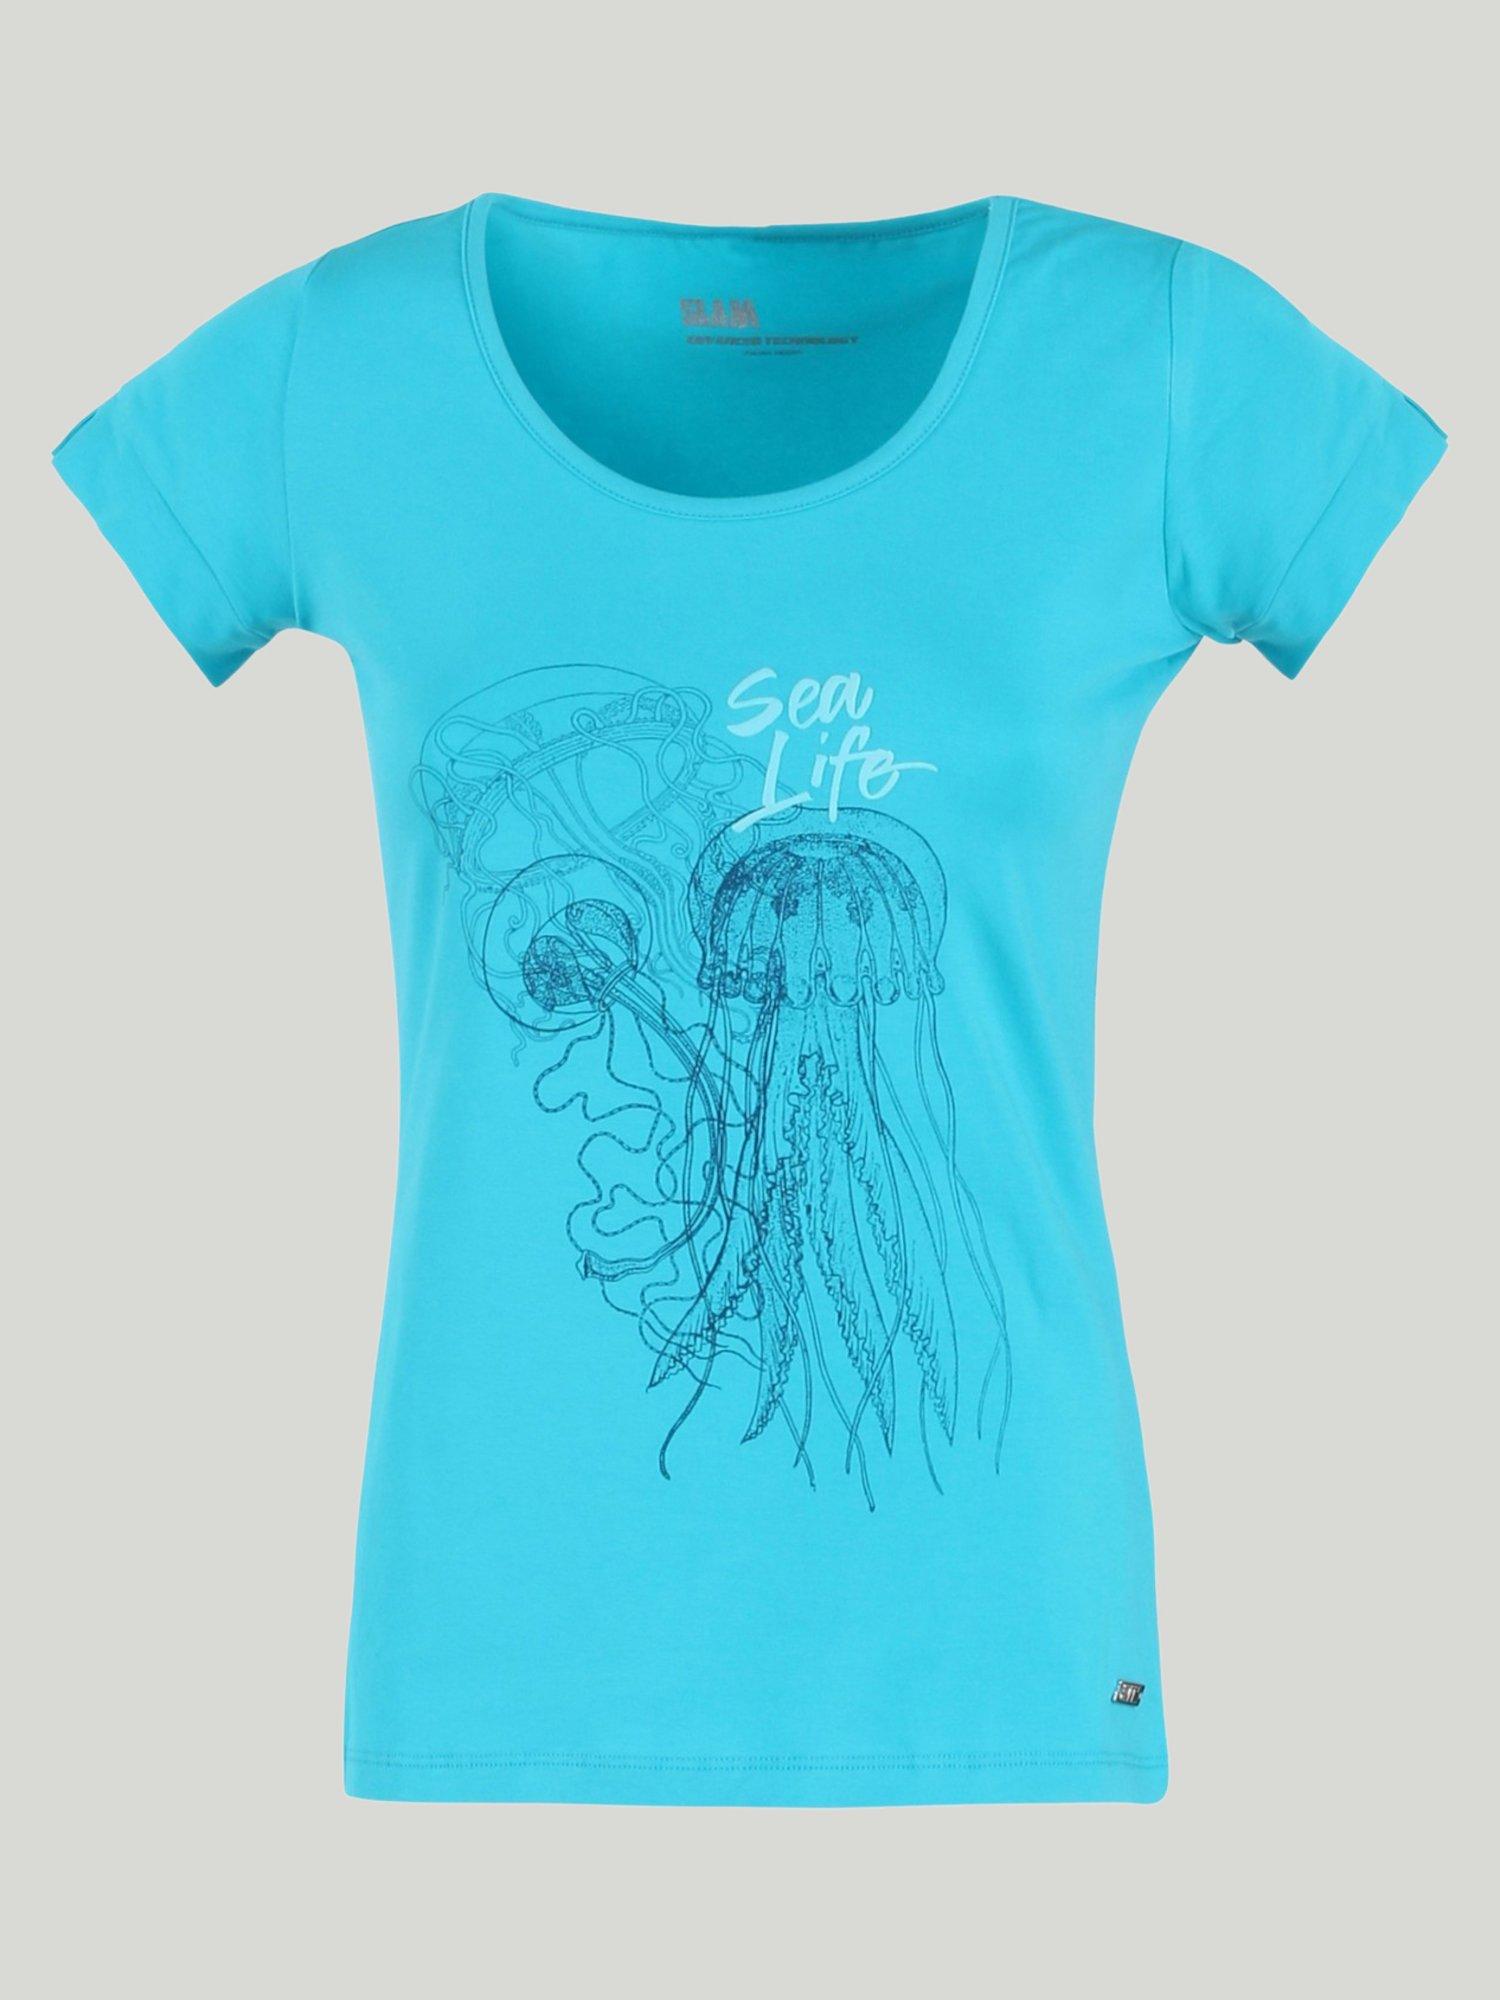 T-SHIRT HOLLY - Azul Caribe